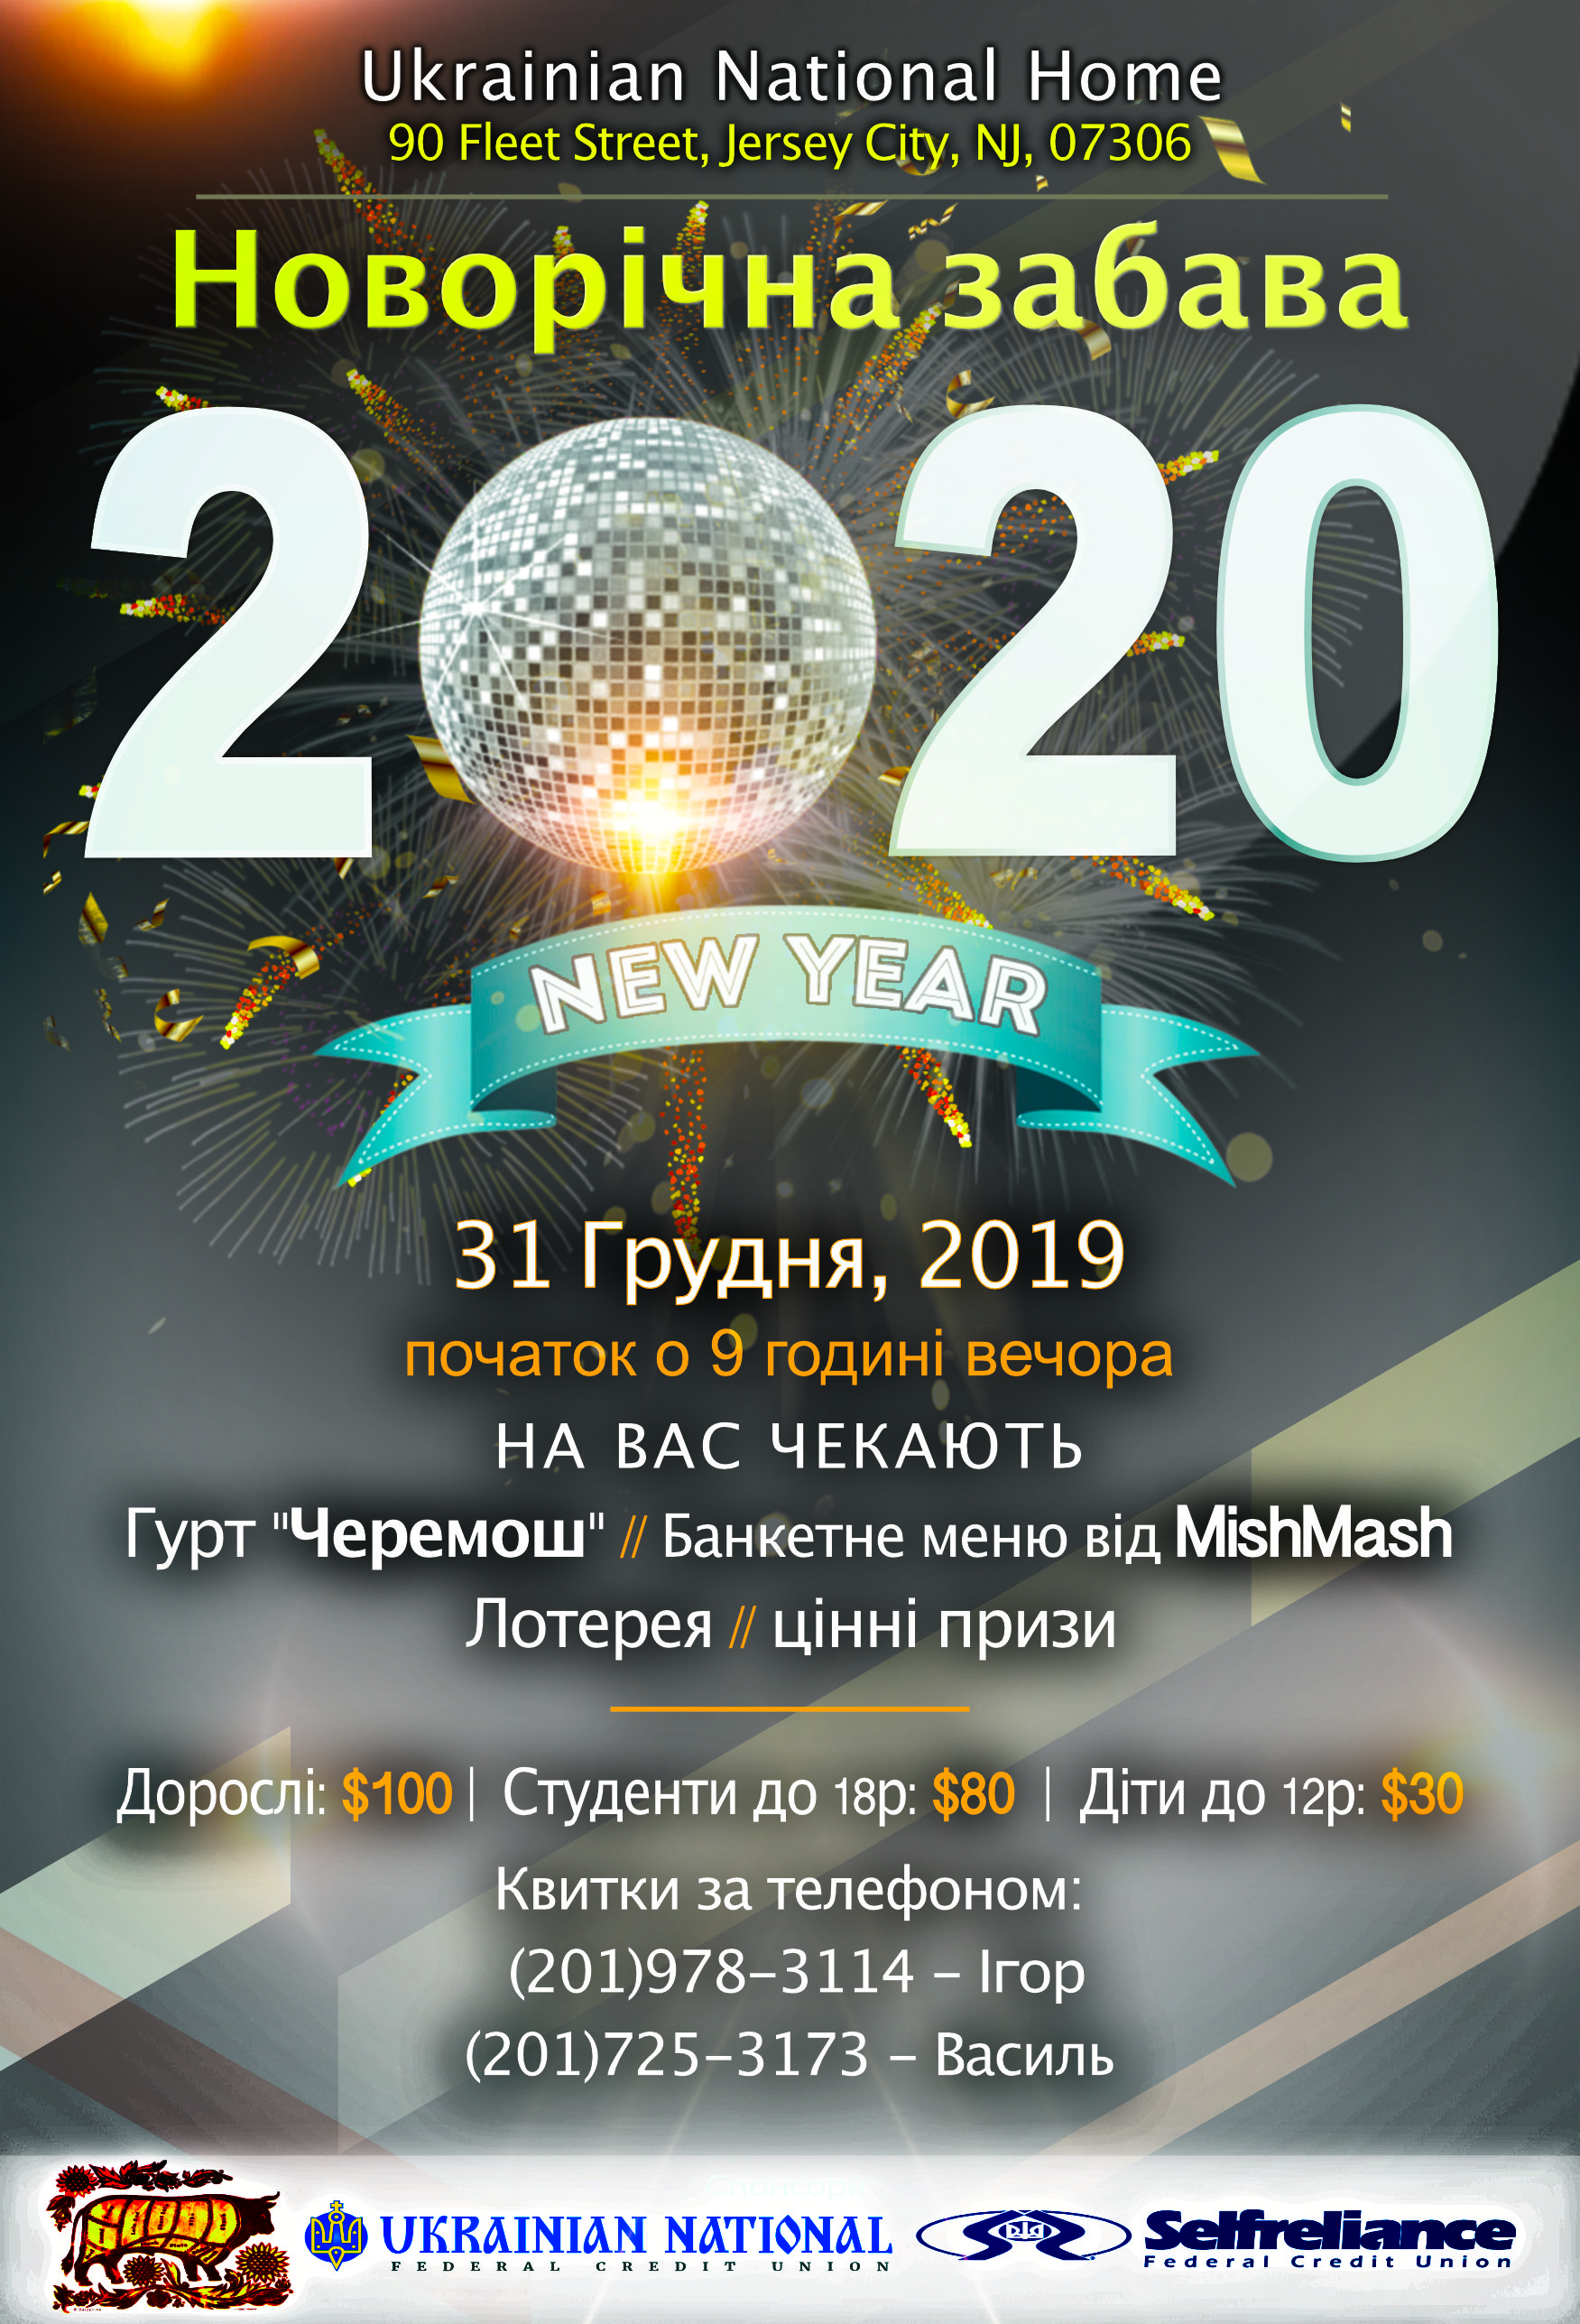 2020 new year1